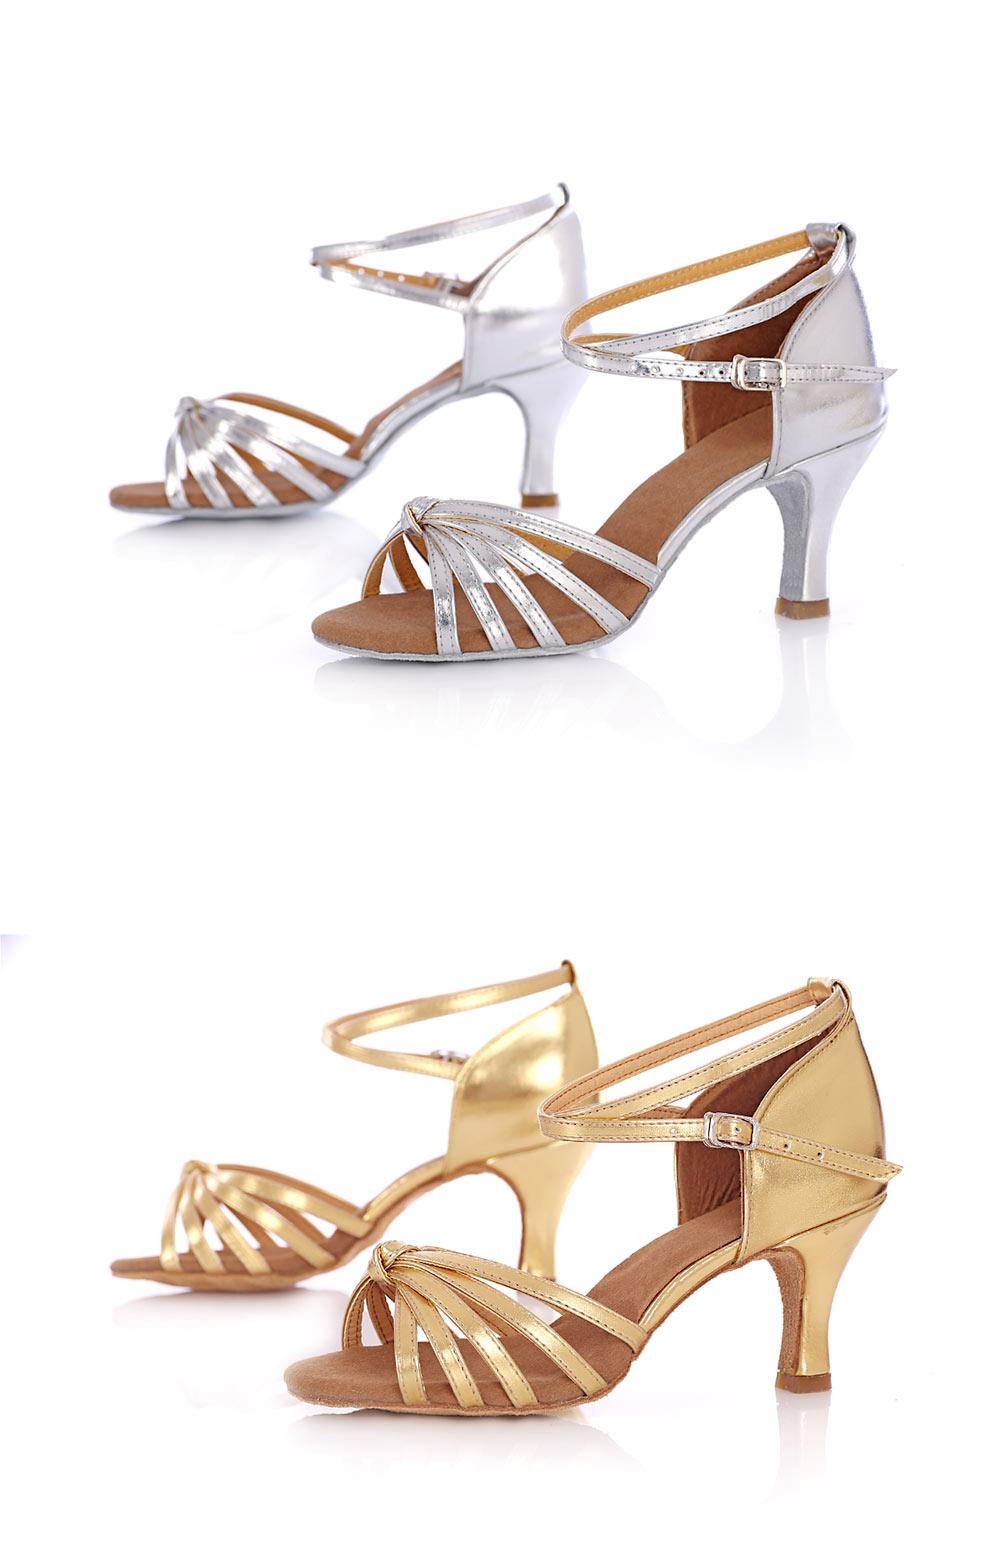 Latin Dance Shoes For Women Salsa Tango Ballroom Dance Shoes High Heels soft Dancing Shoes 5 7cm Heel zapatos baile comfortable (10)